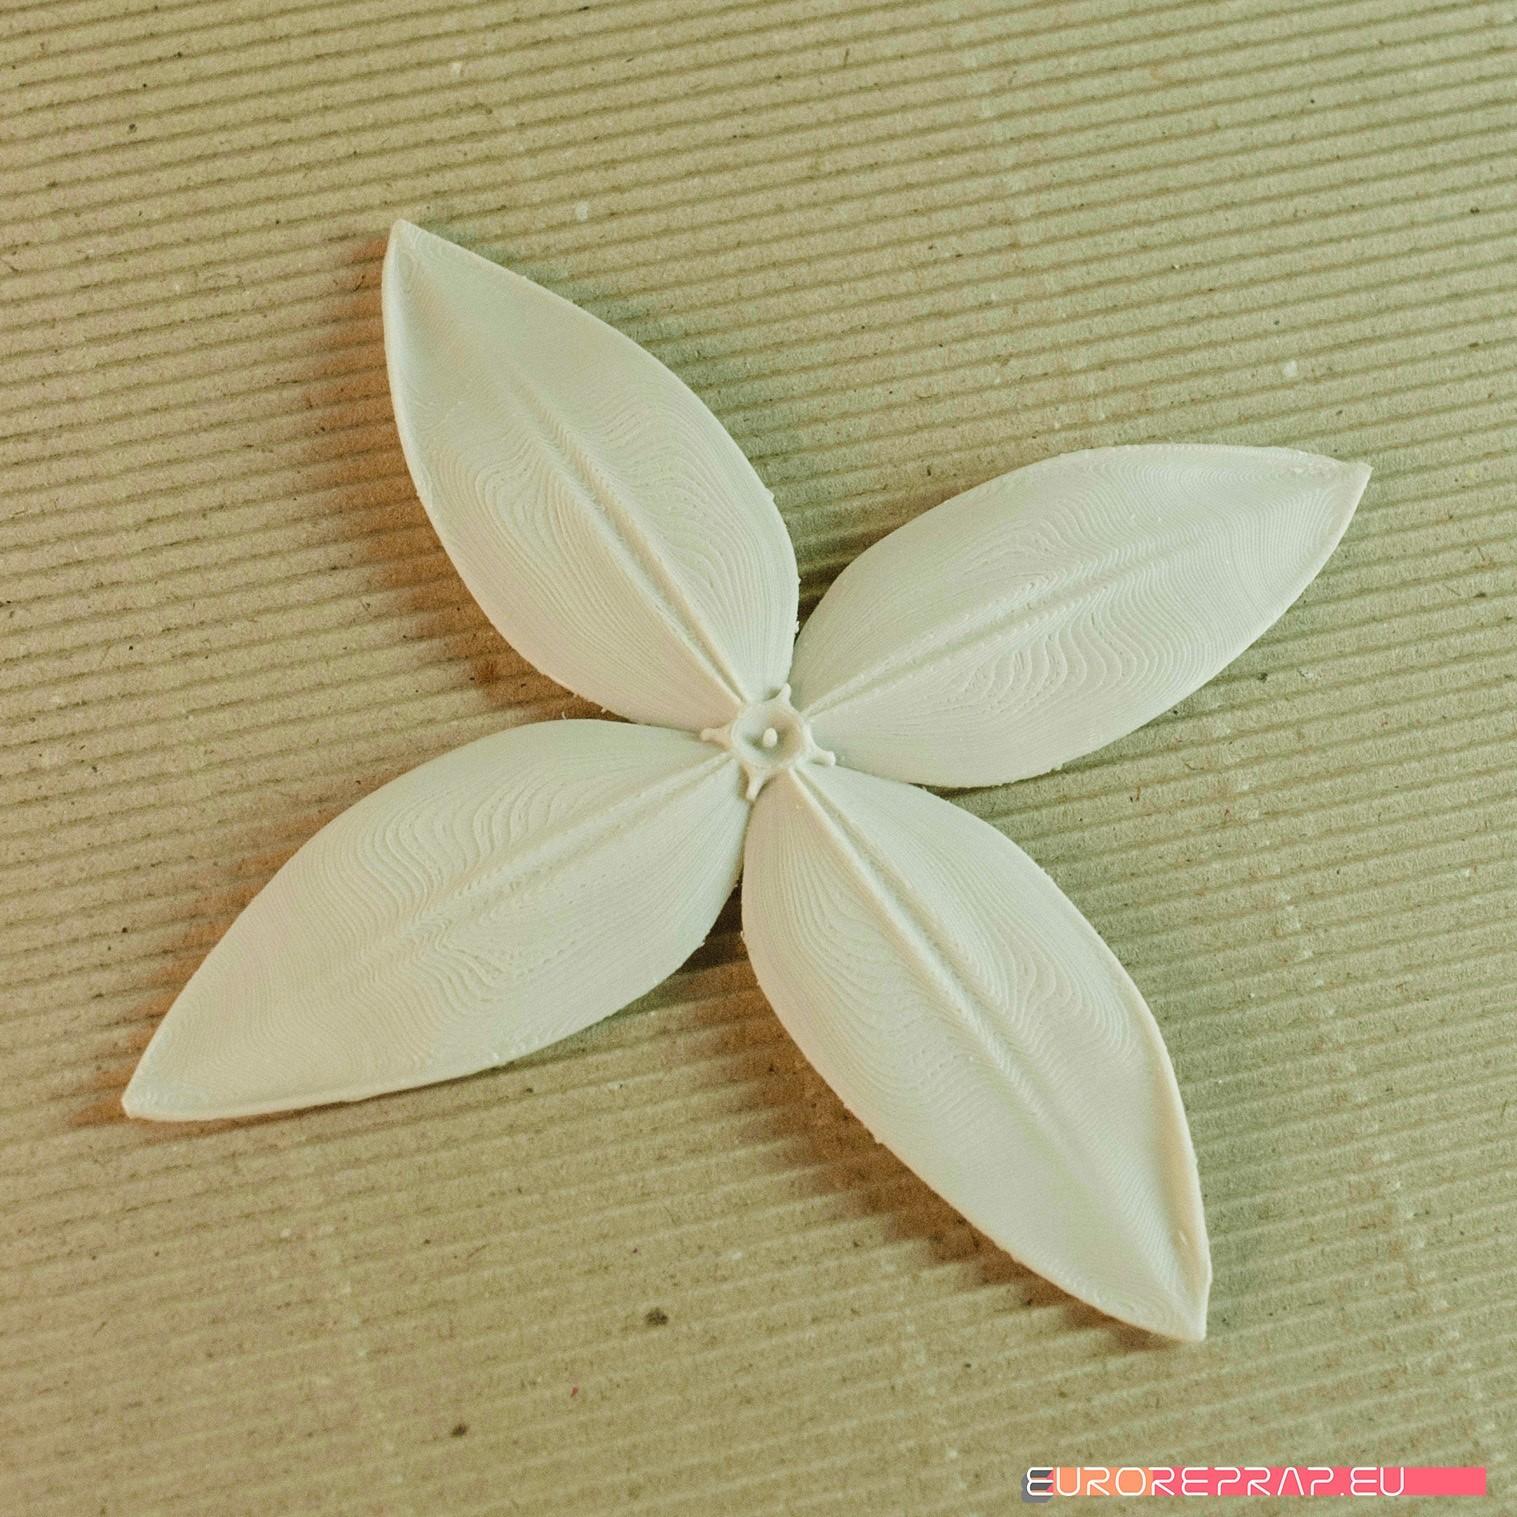 06b.jpg Download STL file flowers: Ixora - 3D printable model • 3D printing object, euroreprap_eu